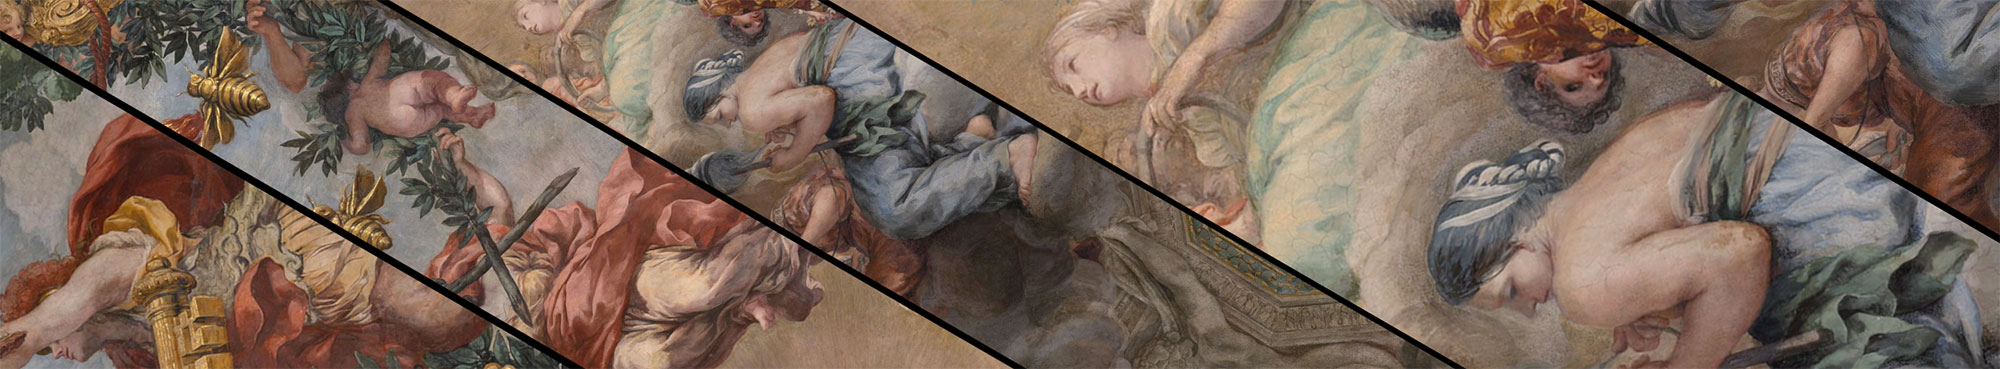 Declinare Roma_Sapienza_ateliercrilo.com_4.jpg